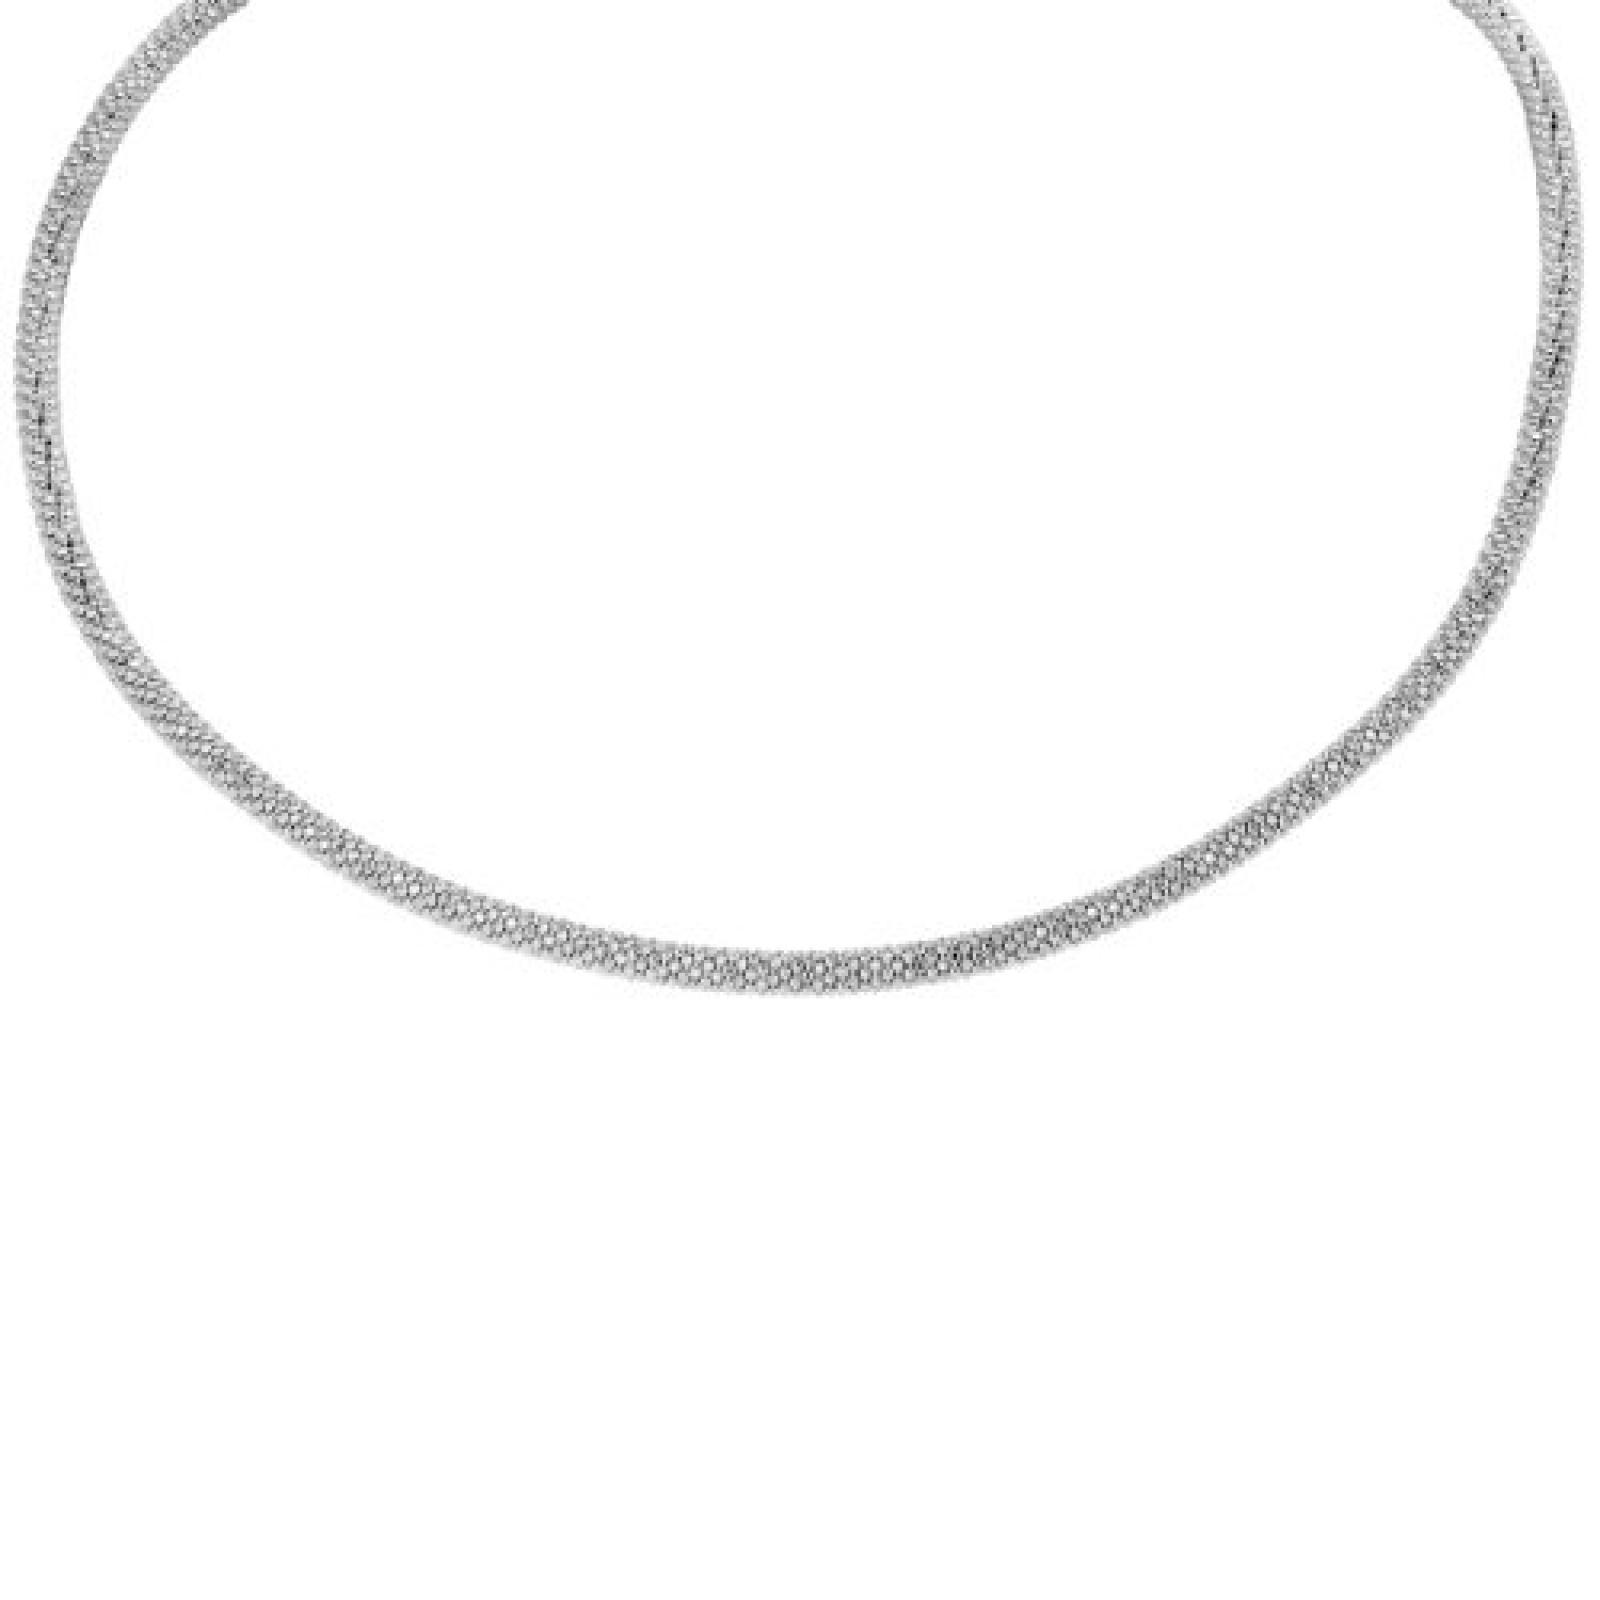 Bella Donna Damen Halskette 925 Sterling Silber 43.0 cm 61484309